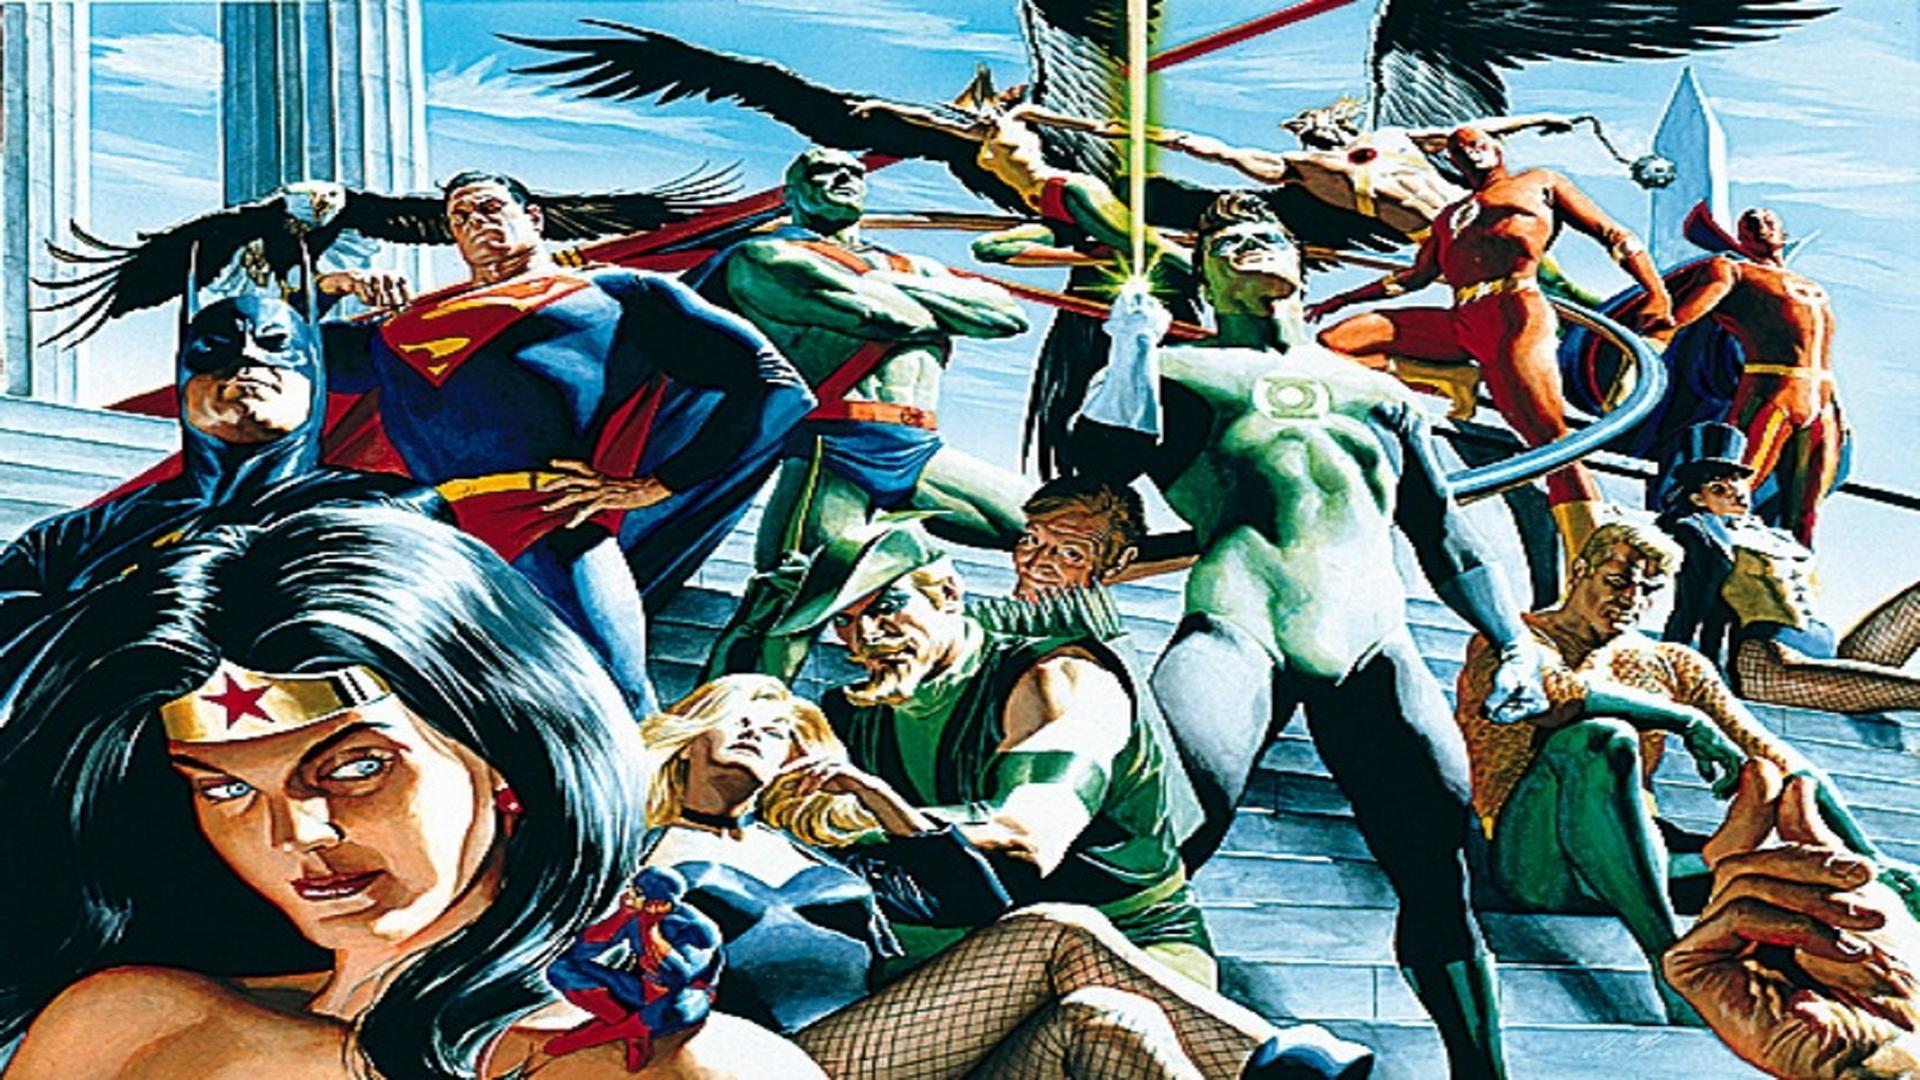 [42+] Justice League HD Wallpapers on WallpaperSafari